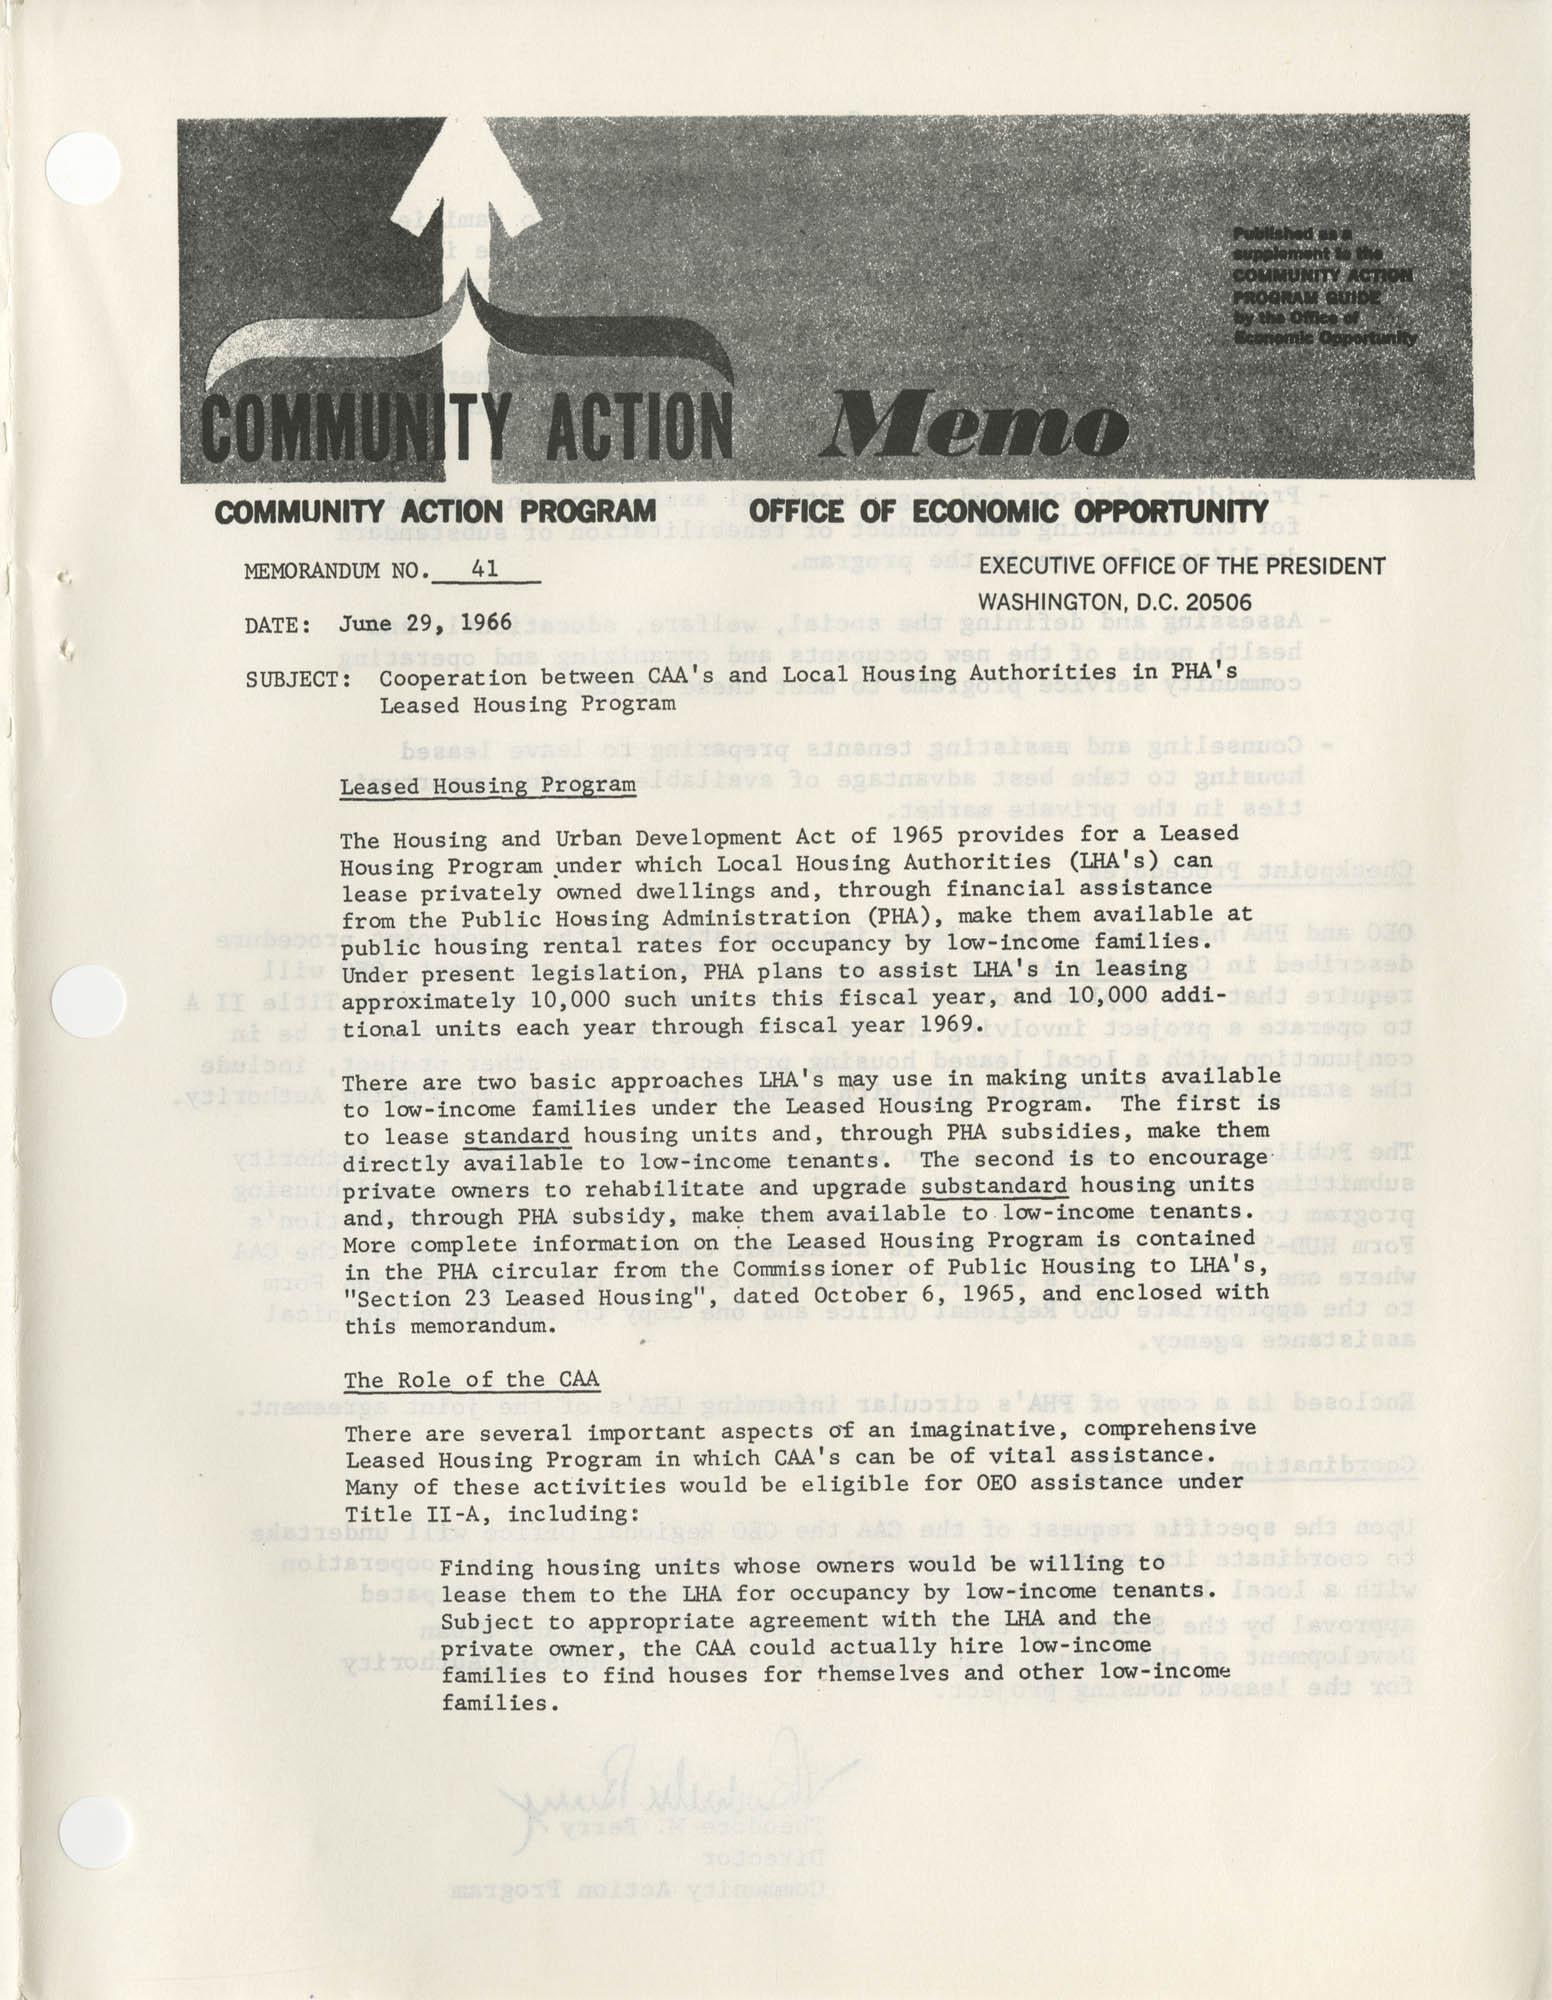 Community Action Program Memorandum No. 41, Memo Page 1